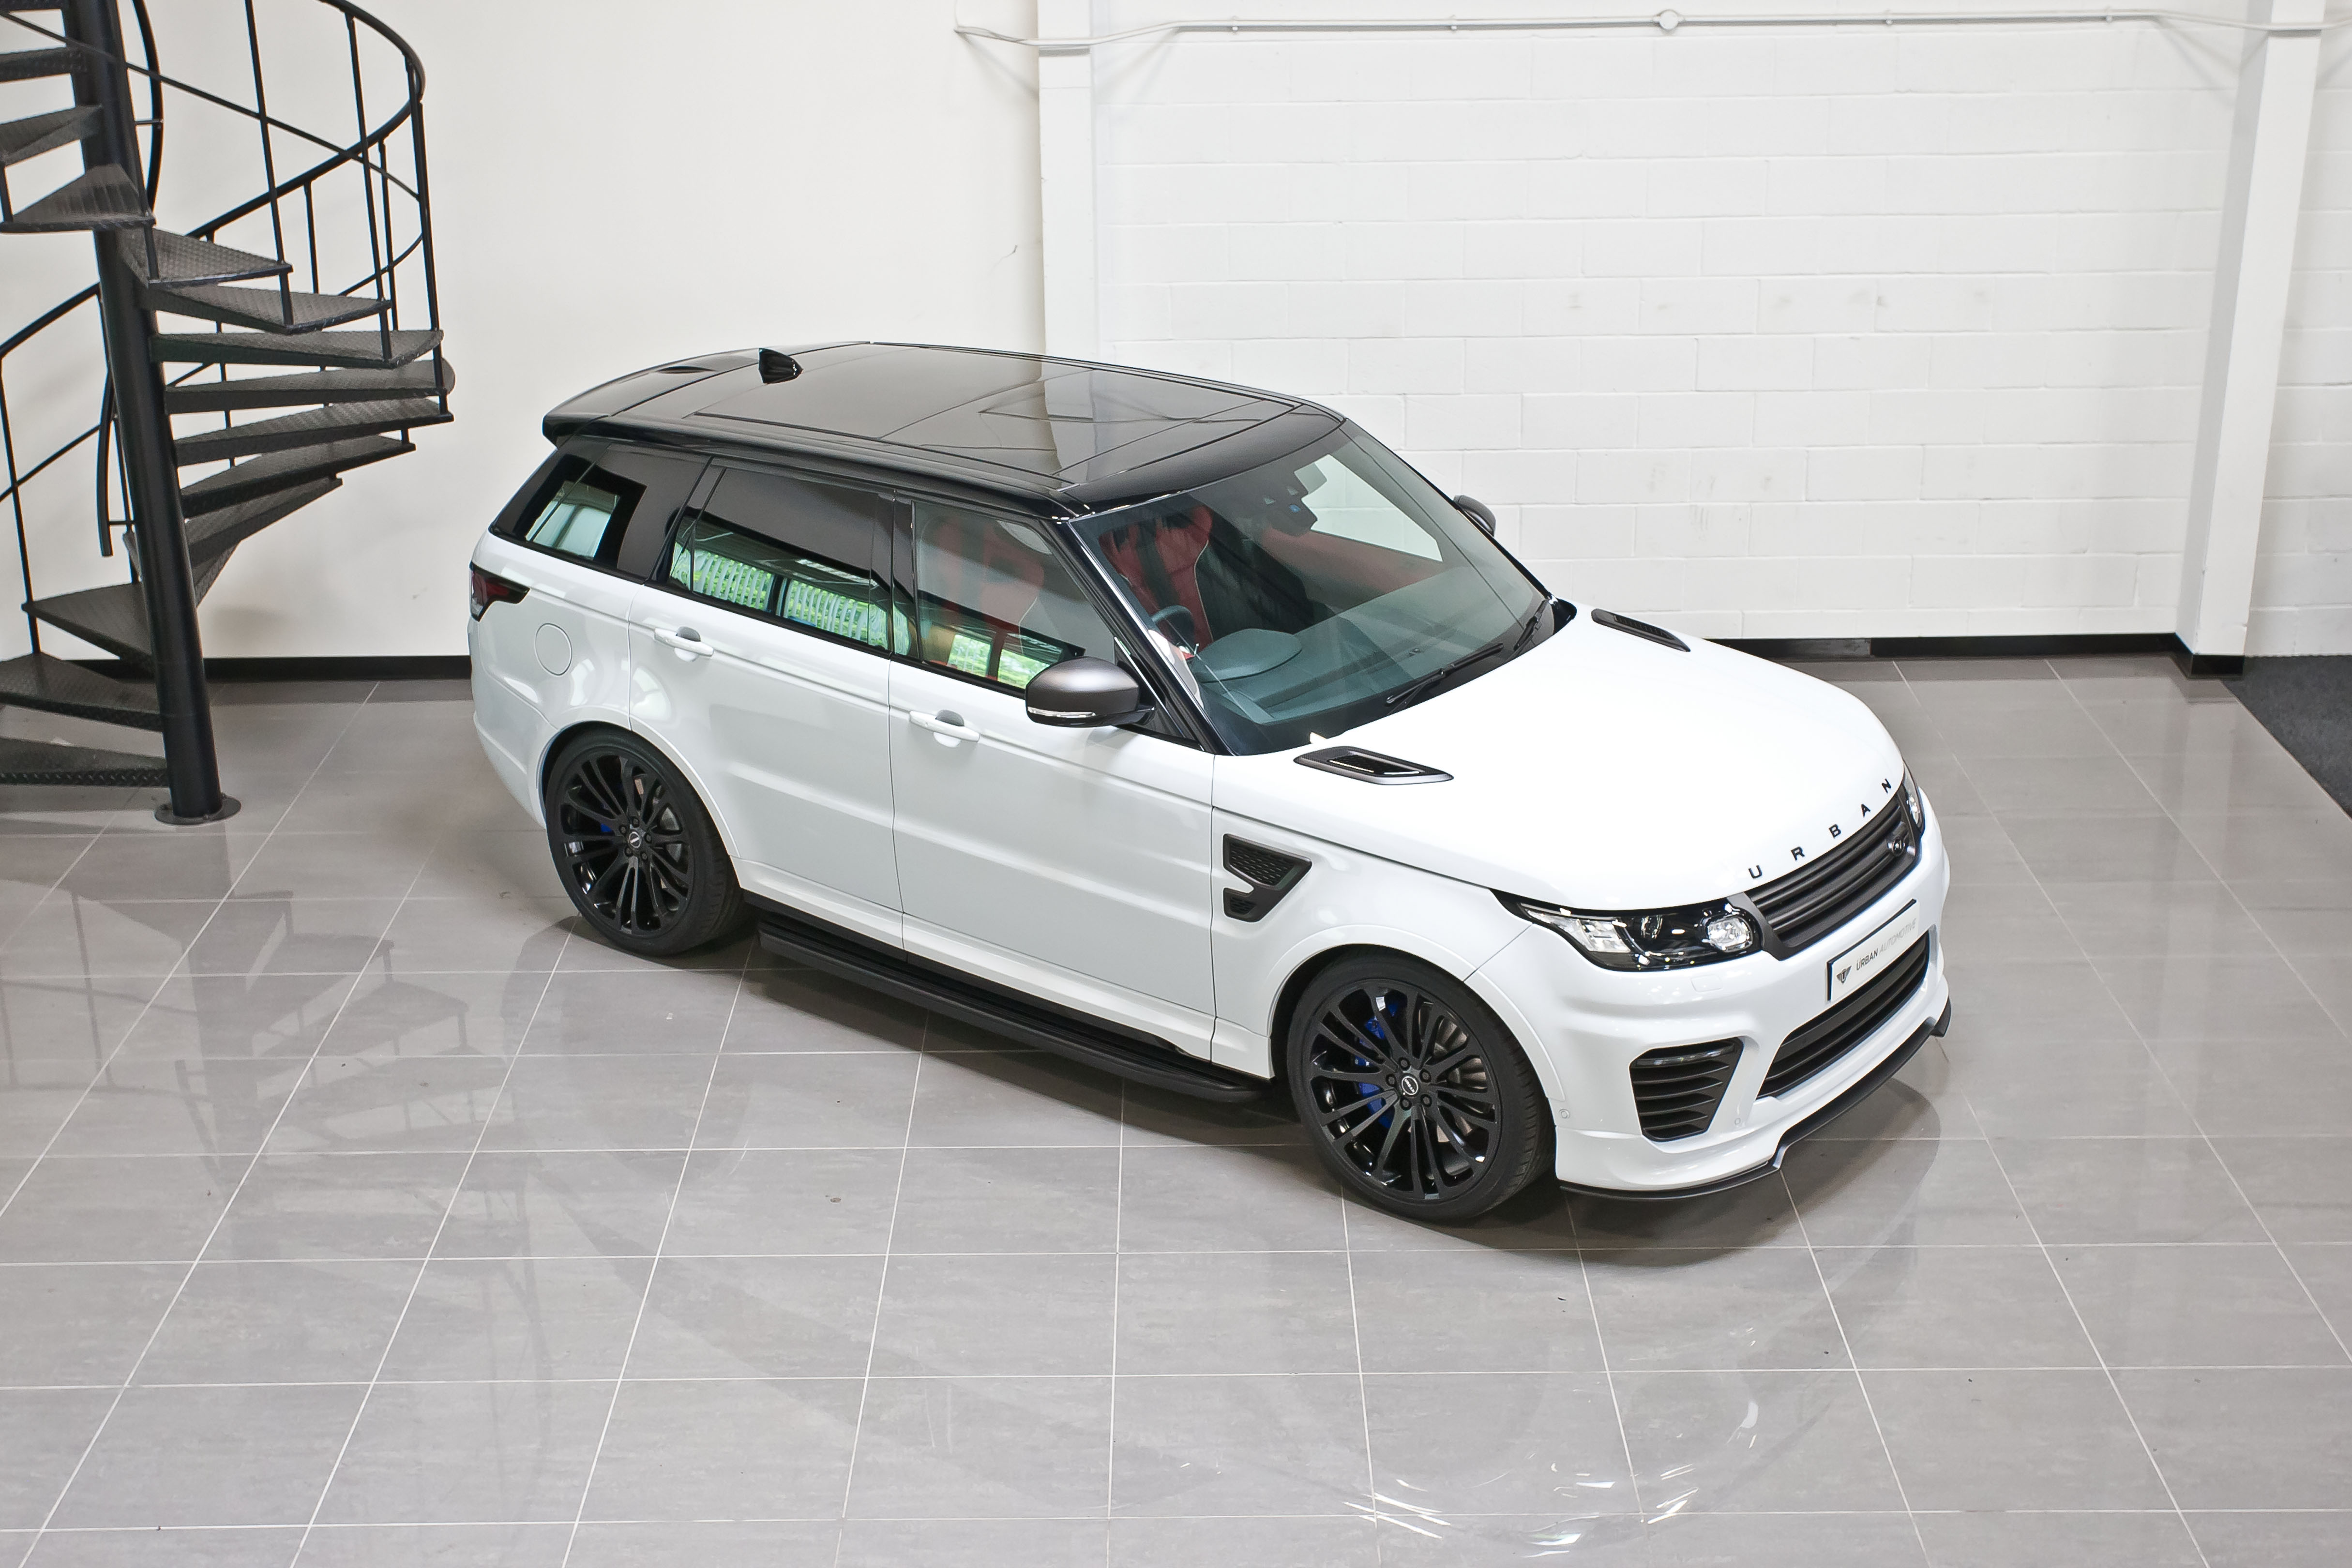 Range Rover SVR Yulong Matte Carbon28